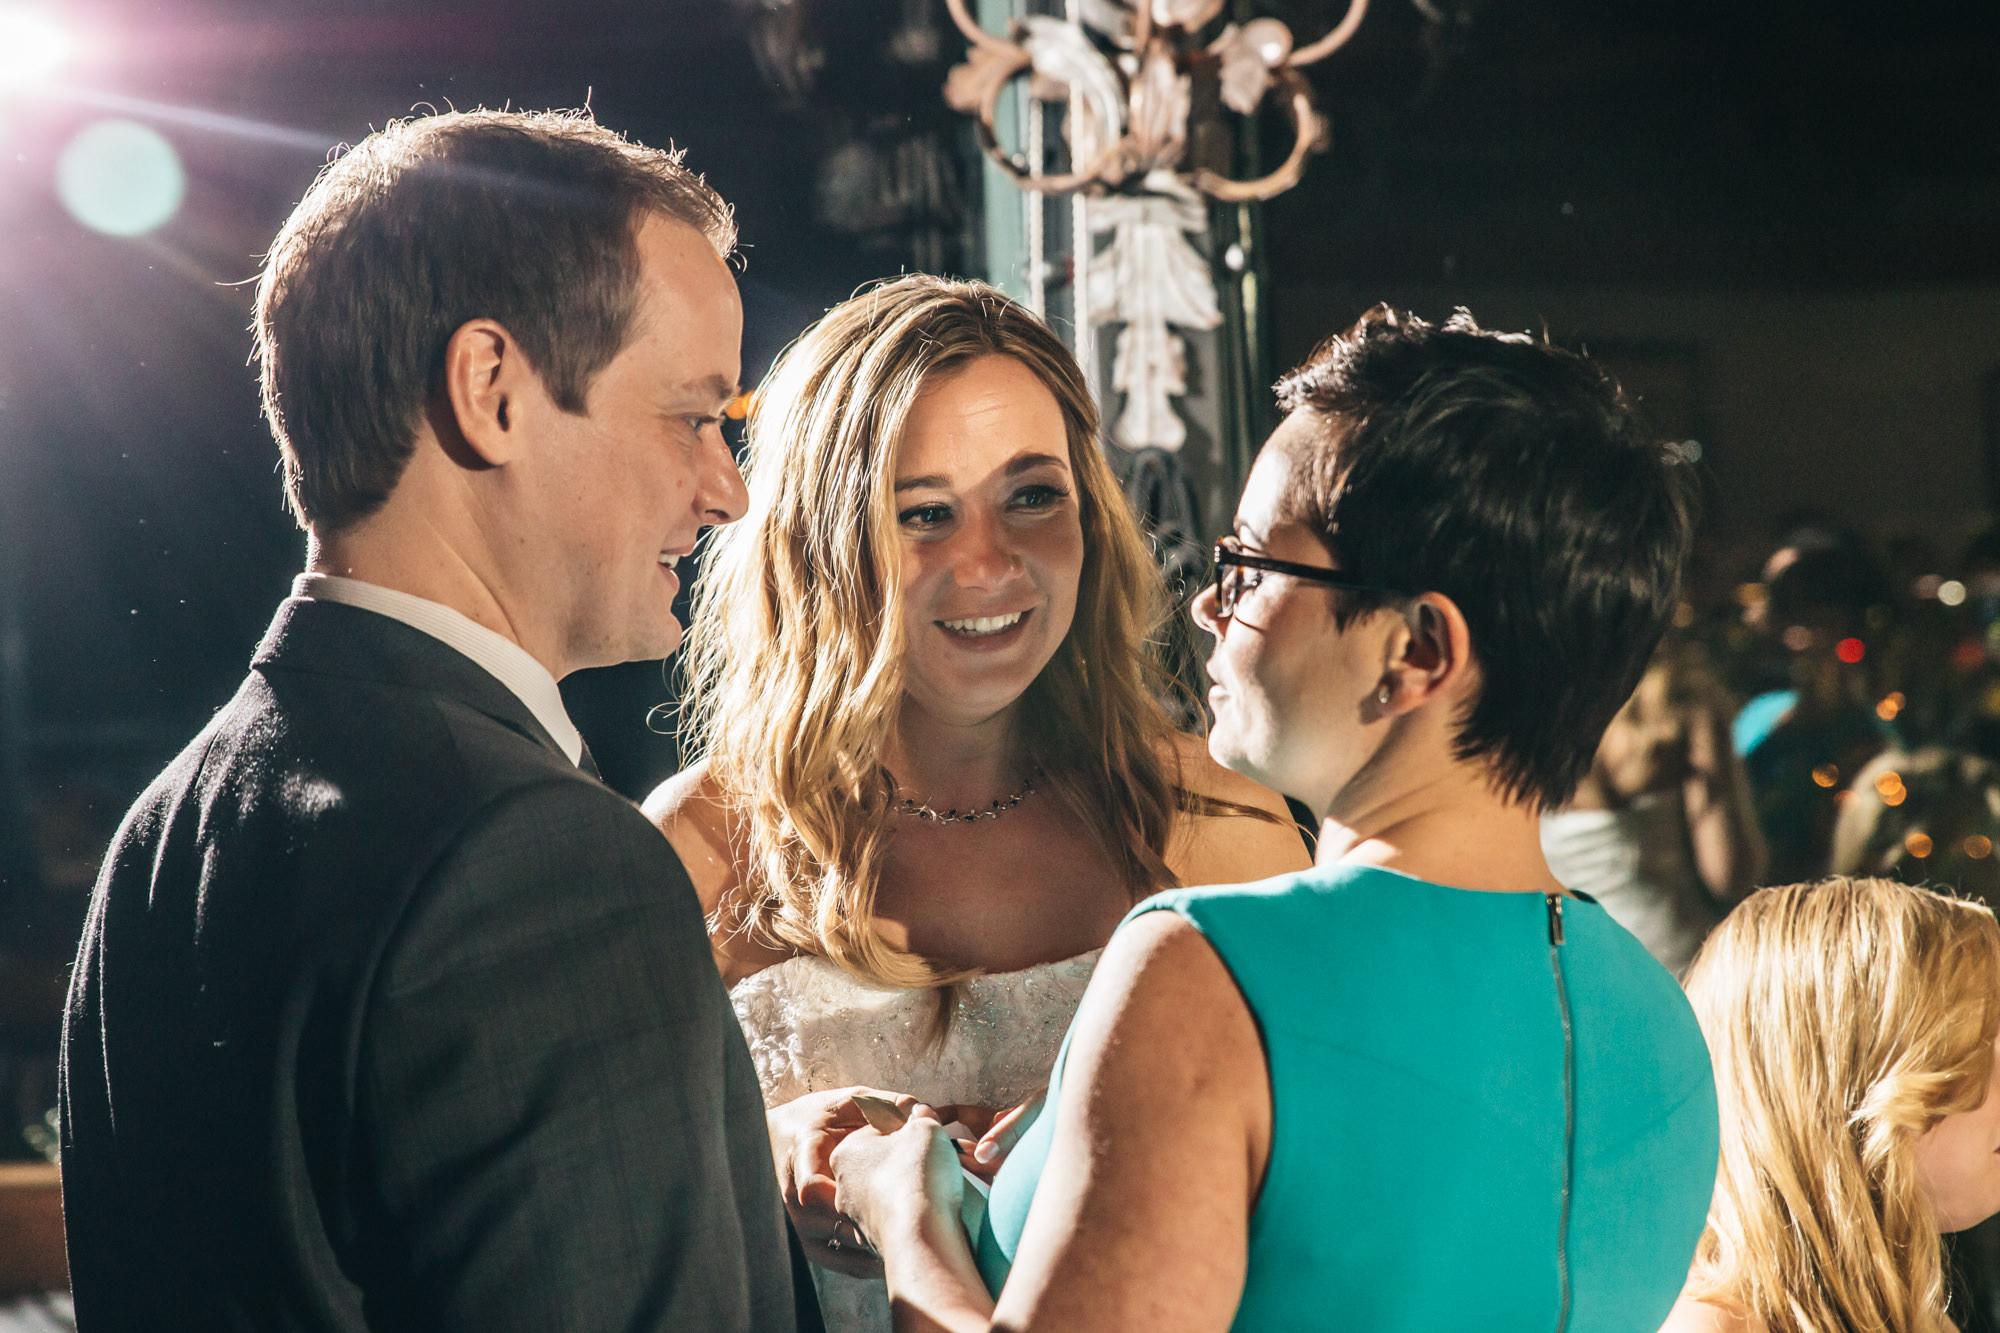 66-seasons-in-the-park-wedding-reception.jpg